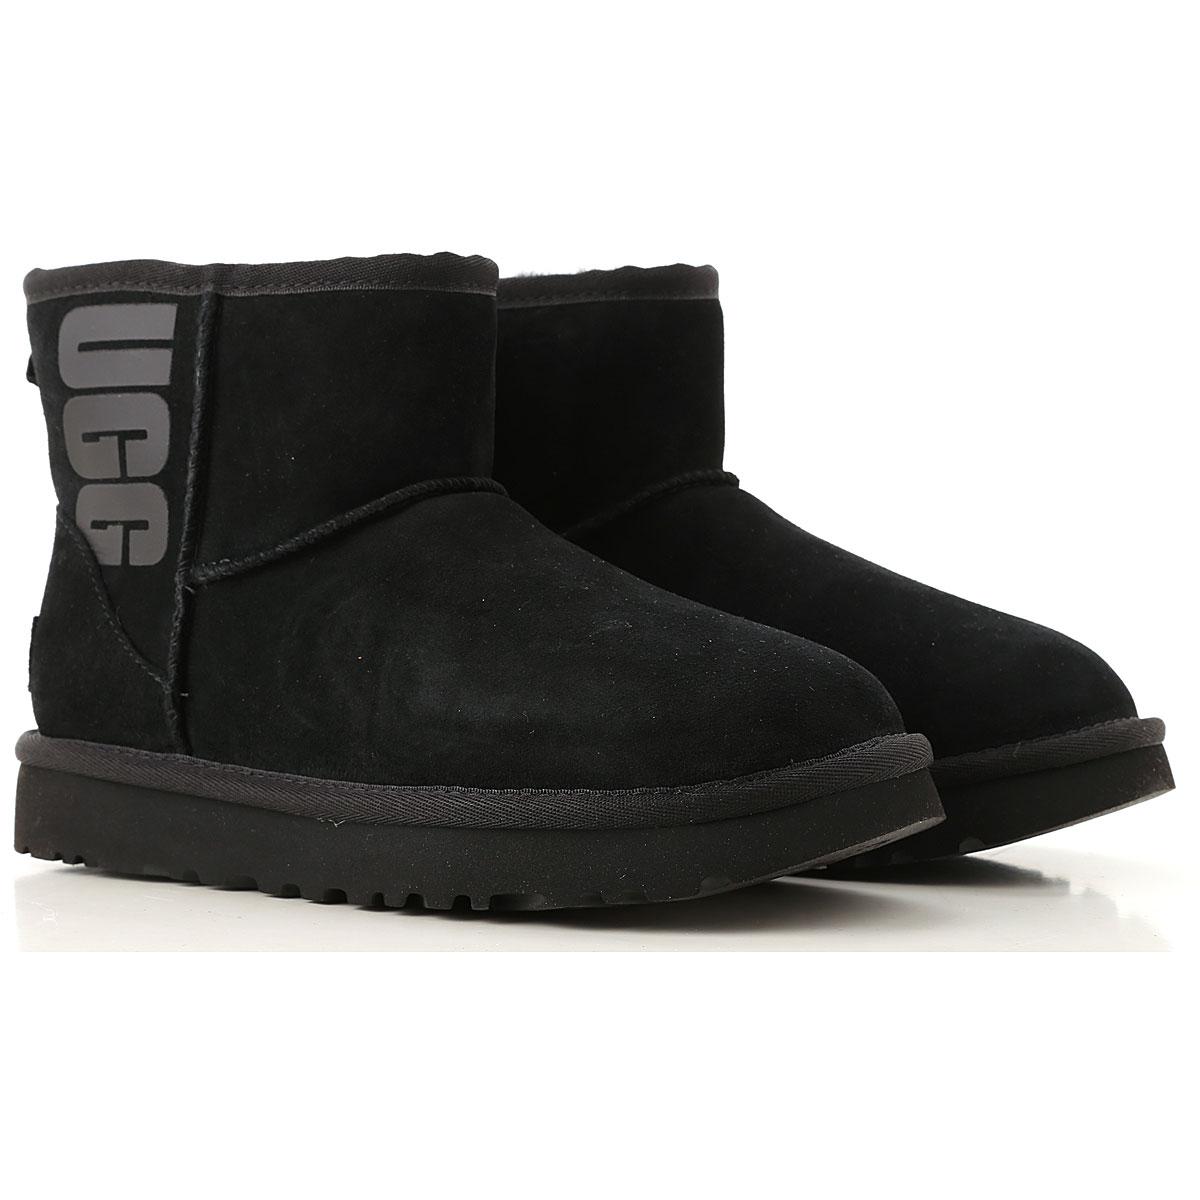 UGG Boots for Women, Booties On Sale, Black, Suede leather, 2019, USA 6 UK 4 5 EU 37 JAPAN 230 USA 9 UK 7 5 EU 40 JAPAN 260